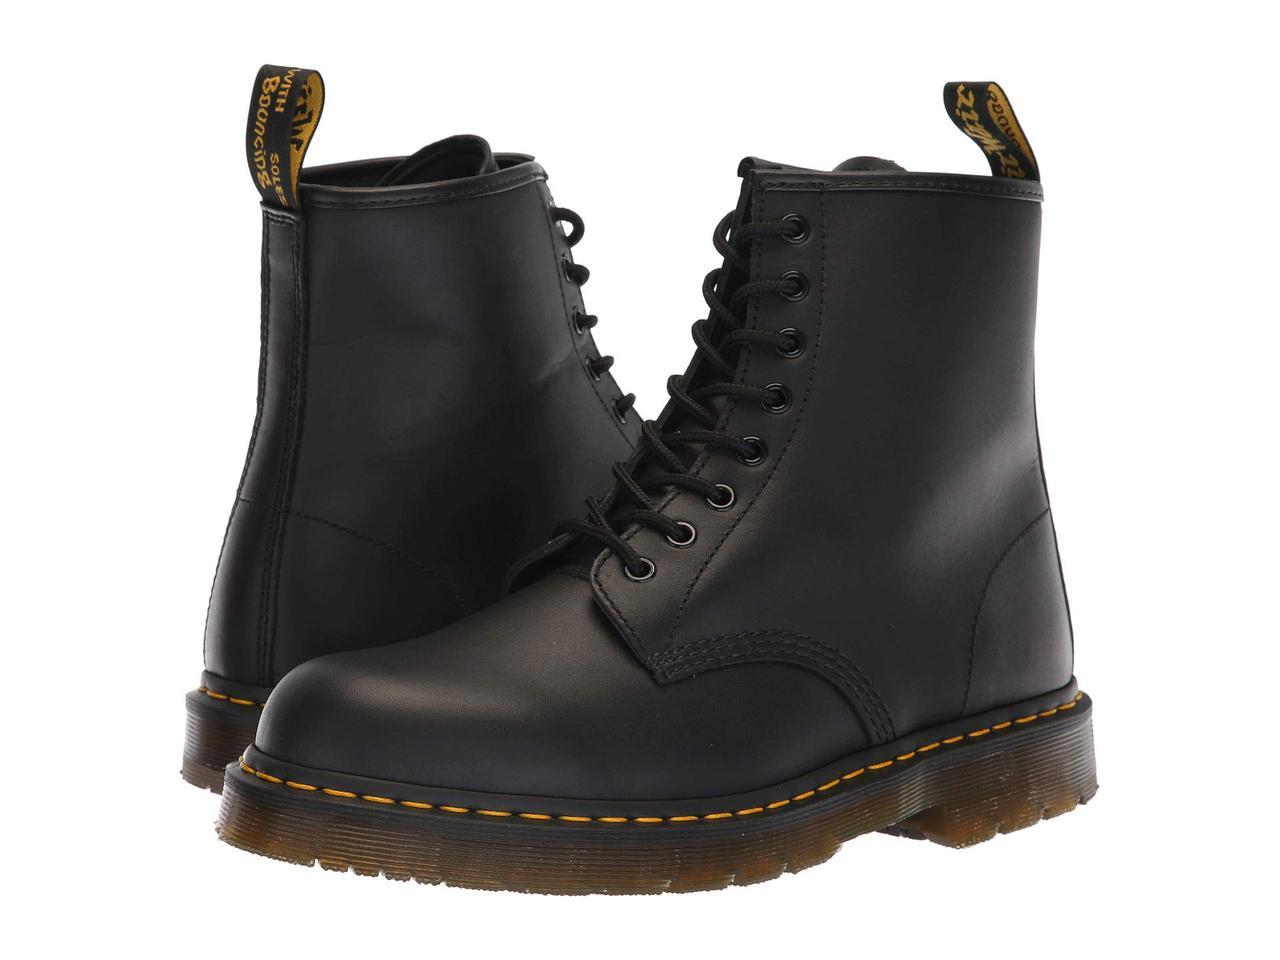 Ботинки/Сапоги (Оригинал) Dr. Martens Work 1460 SR 8-Tie Boot Black